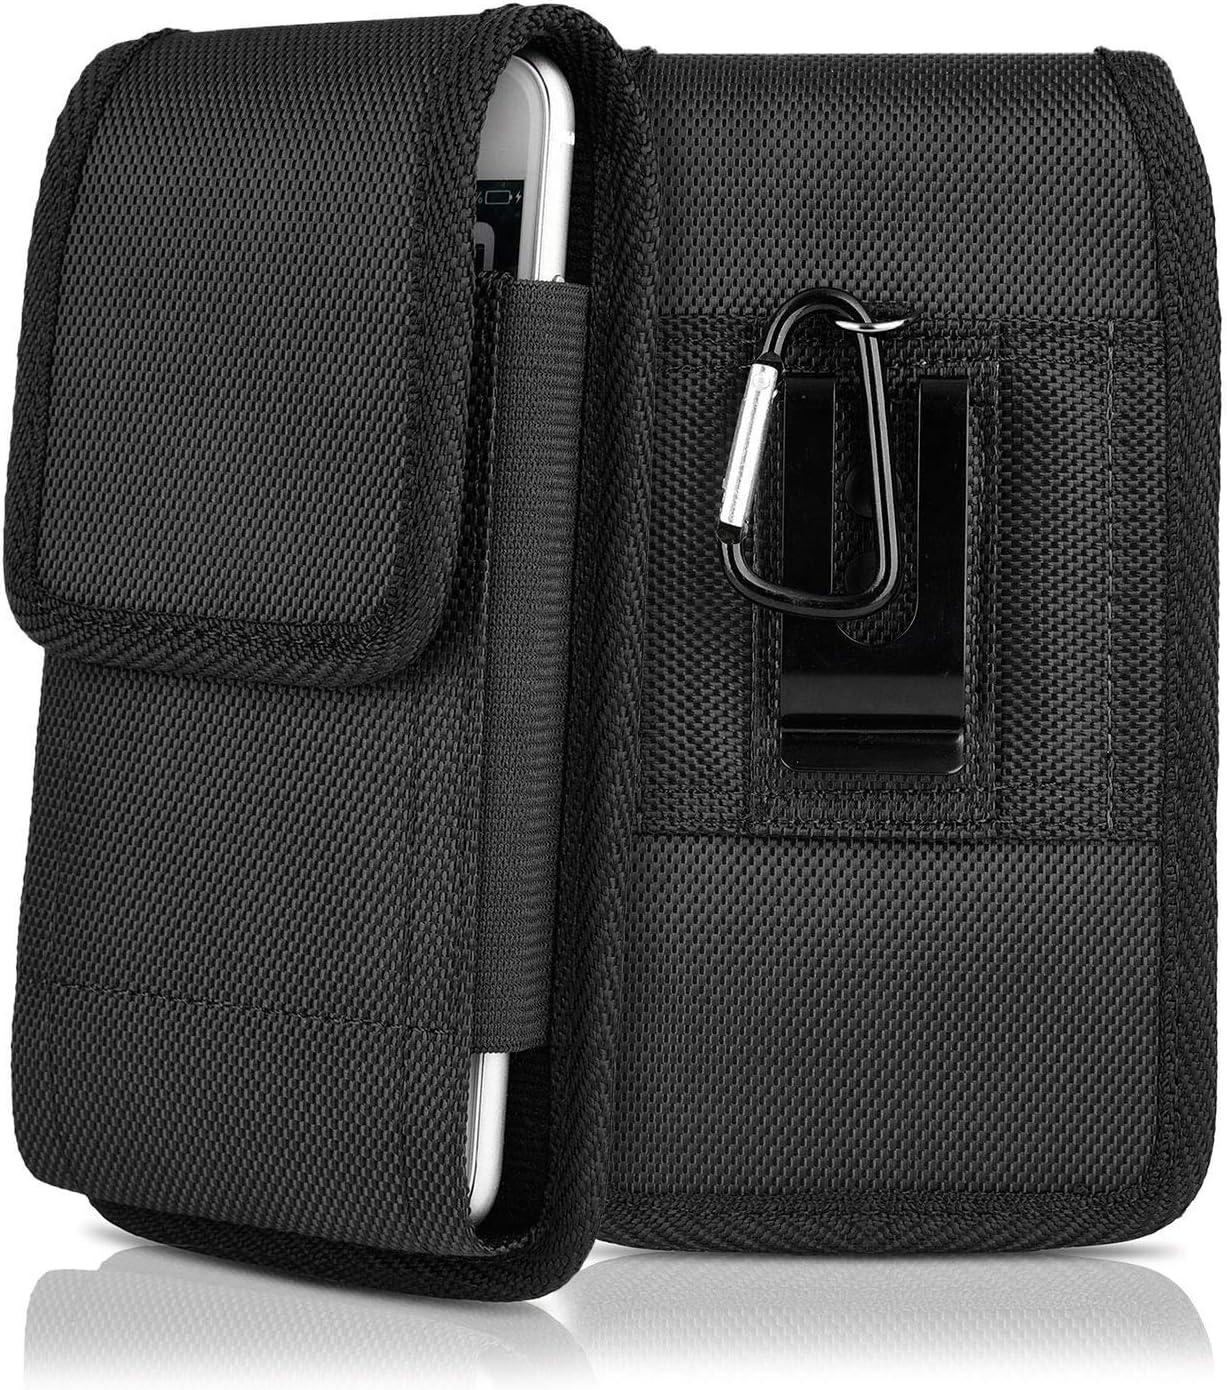 Nylon Pouch Cell Phone Holster for iPhone 8/SE2, kiwitatá Rugged Vertical Belt Clip Holster Case Pouch Holder for iPhone 7 6S 6 iPhone SE 12 Mini